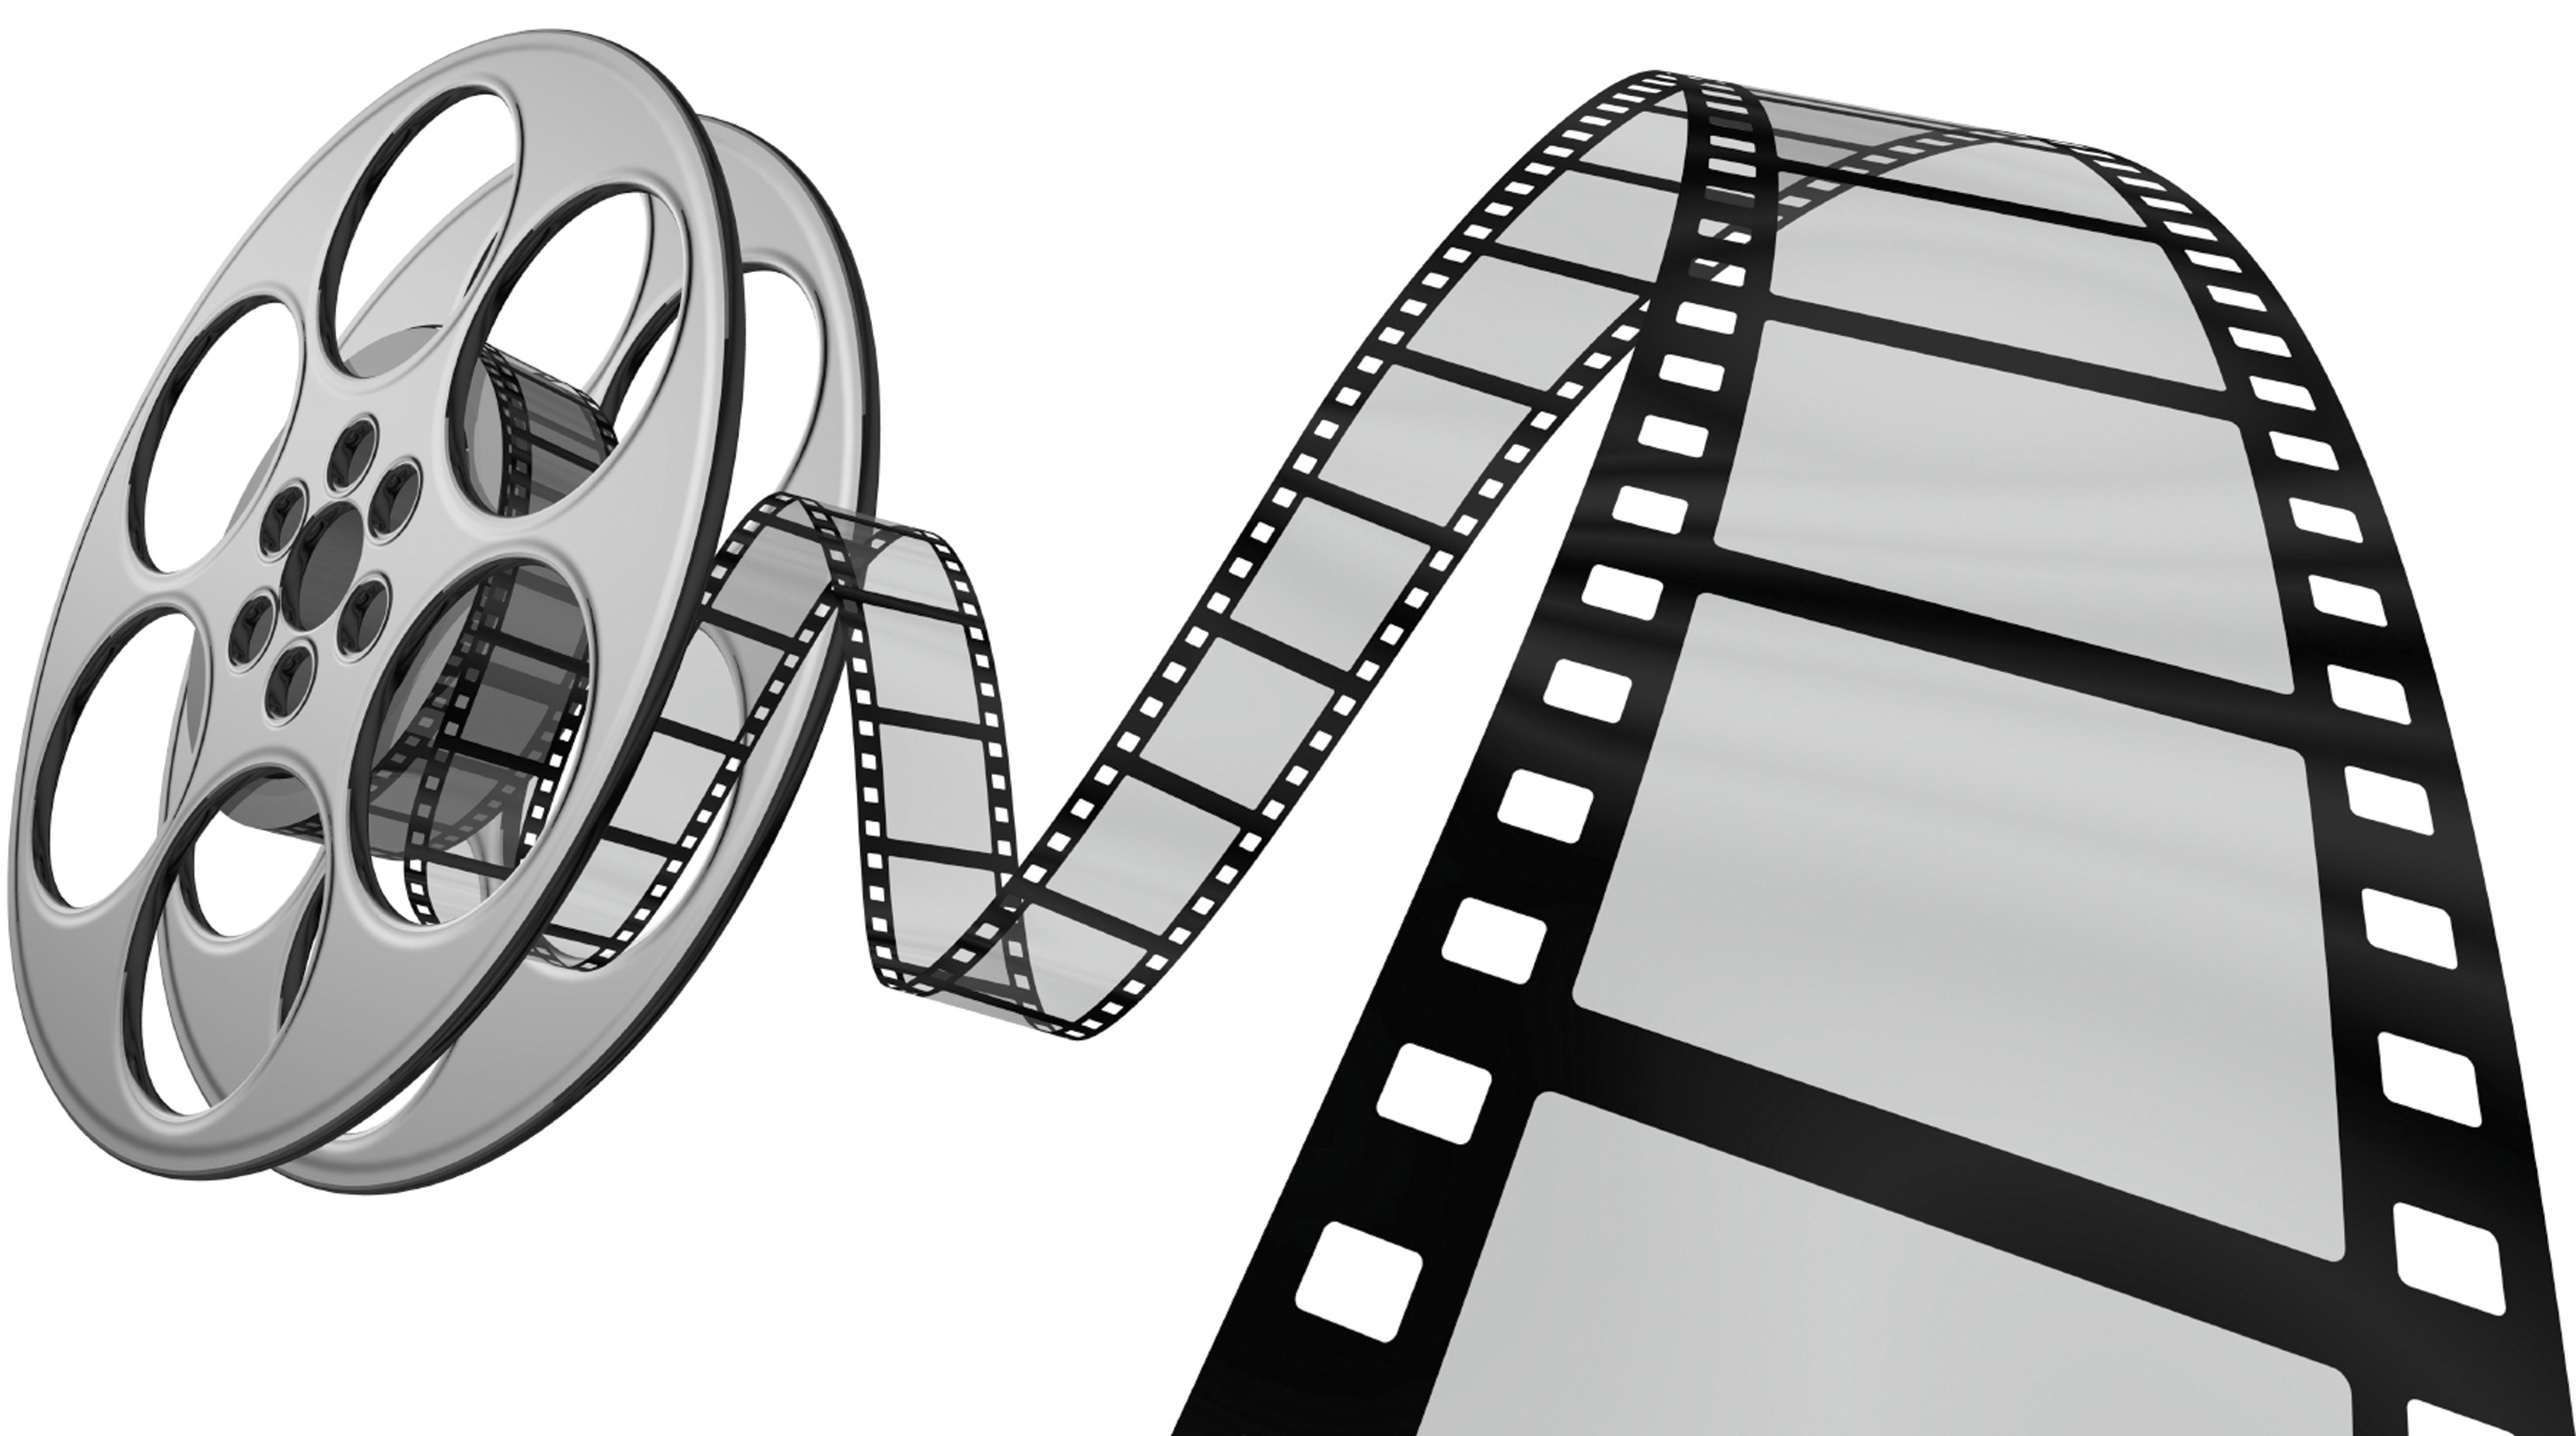 Movie film roll clipart